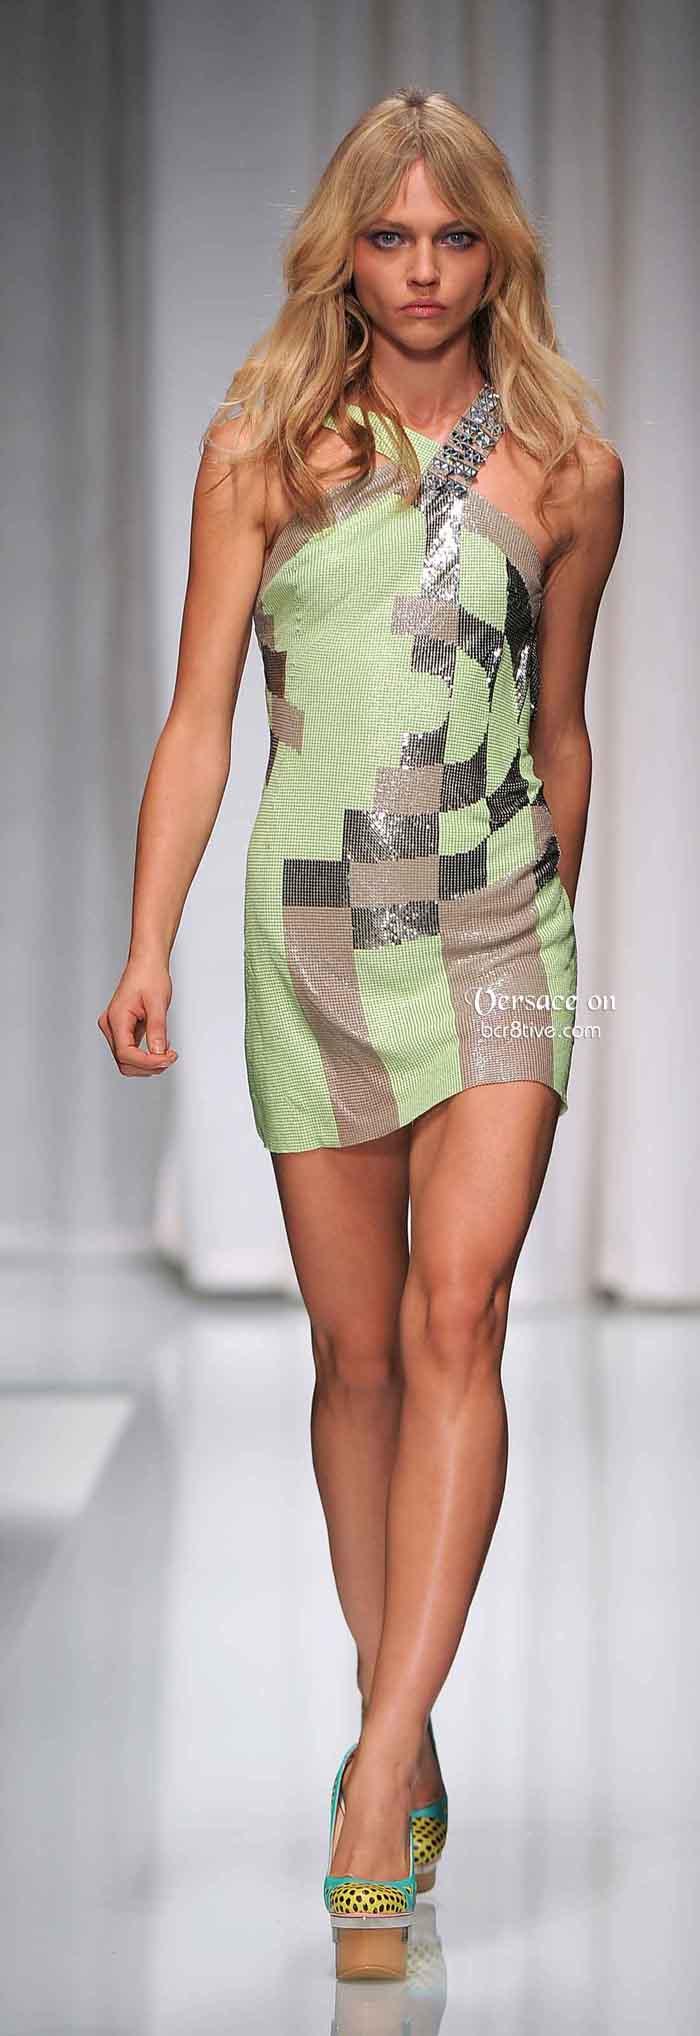 Versace Spring Summer 2010